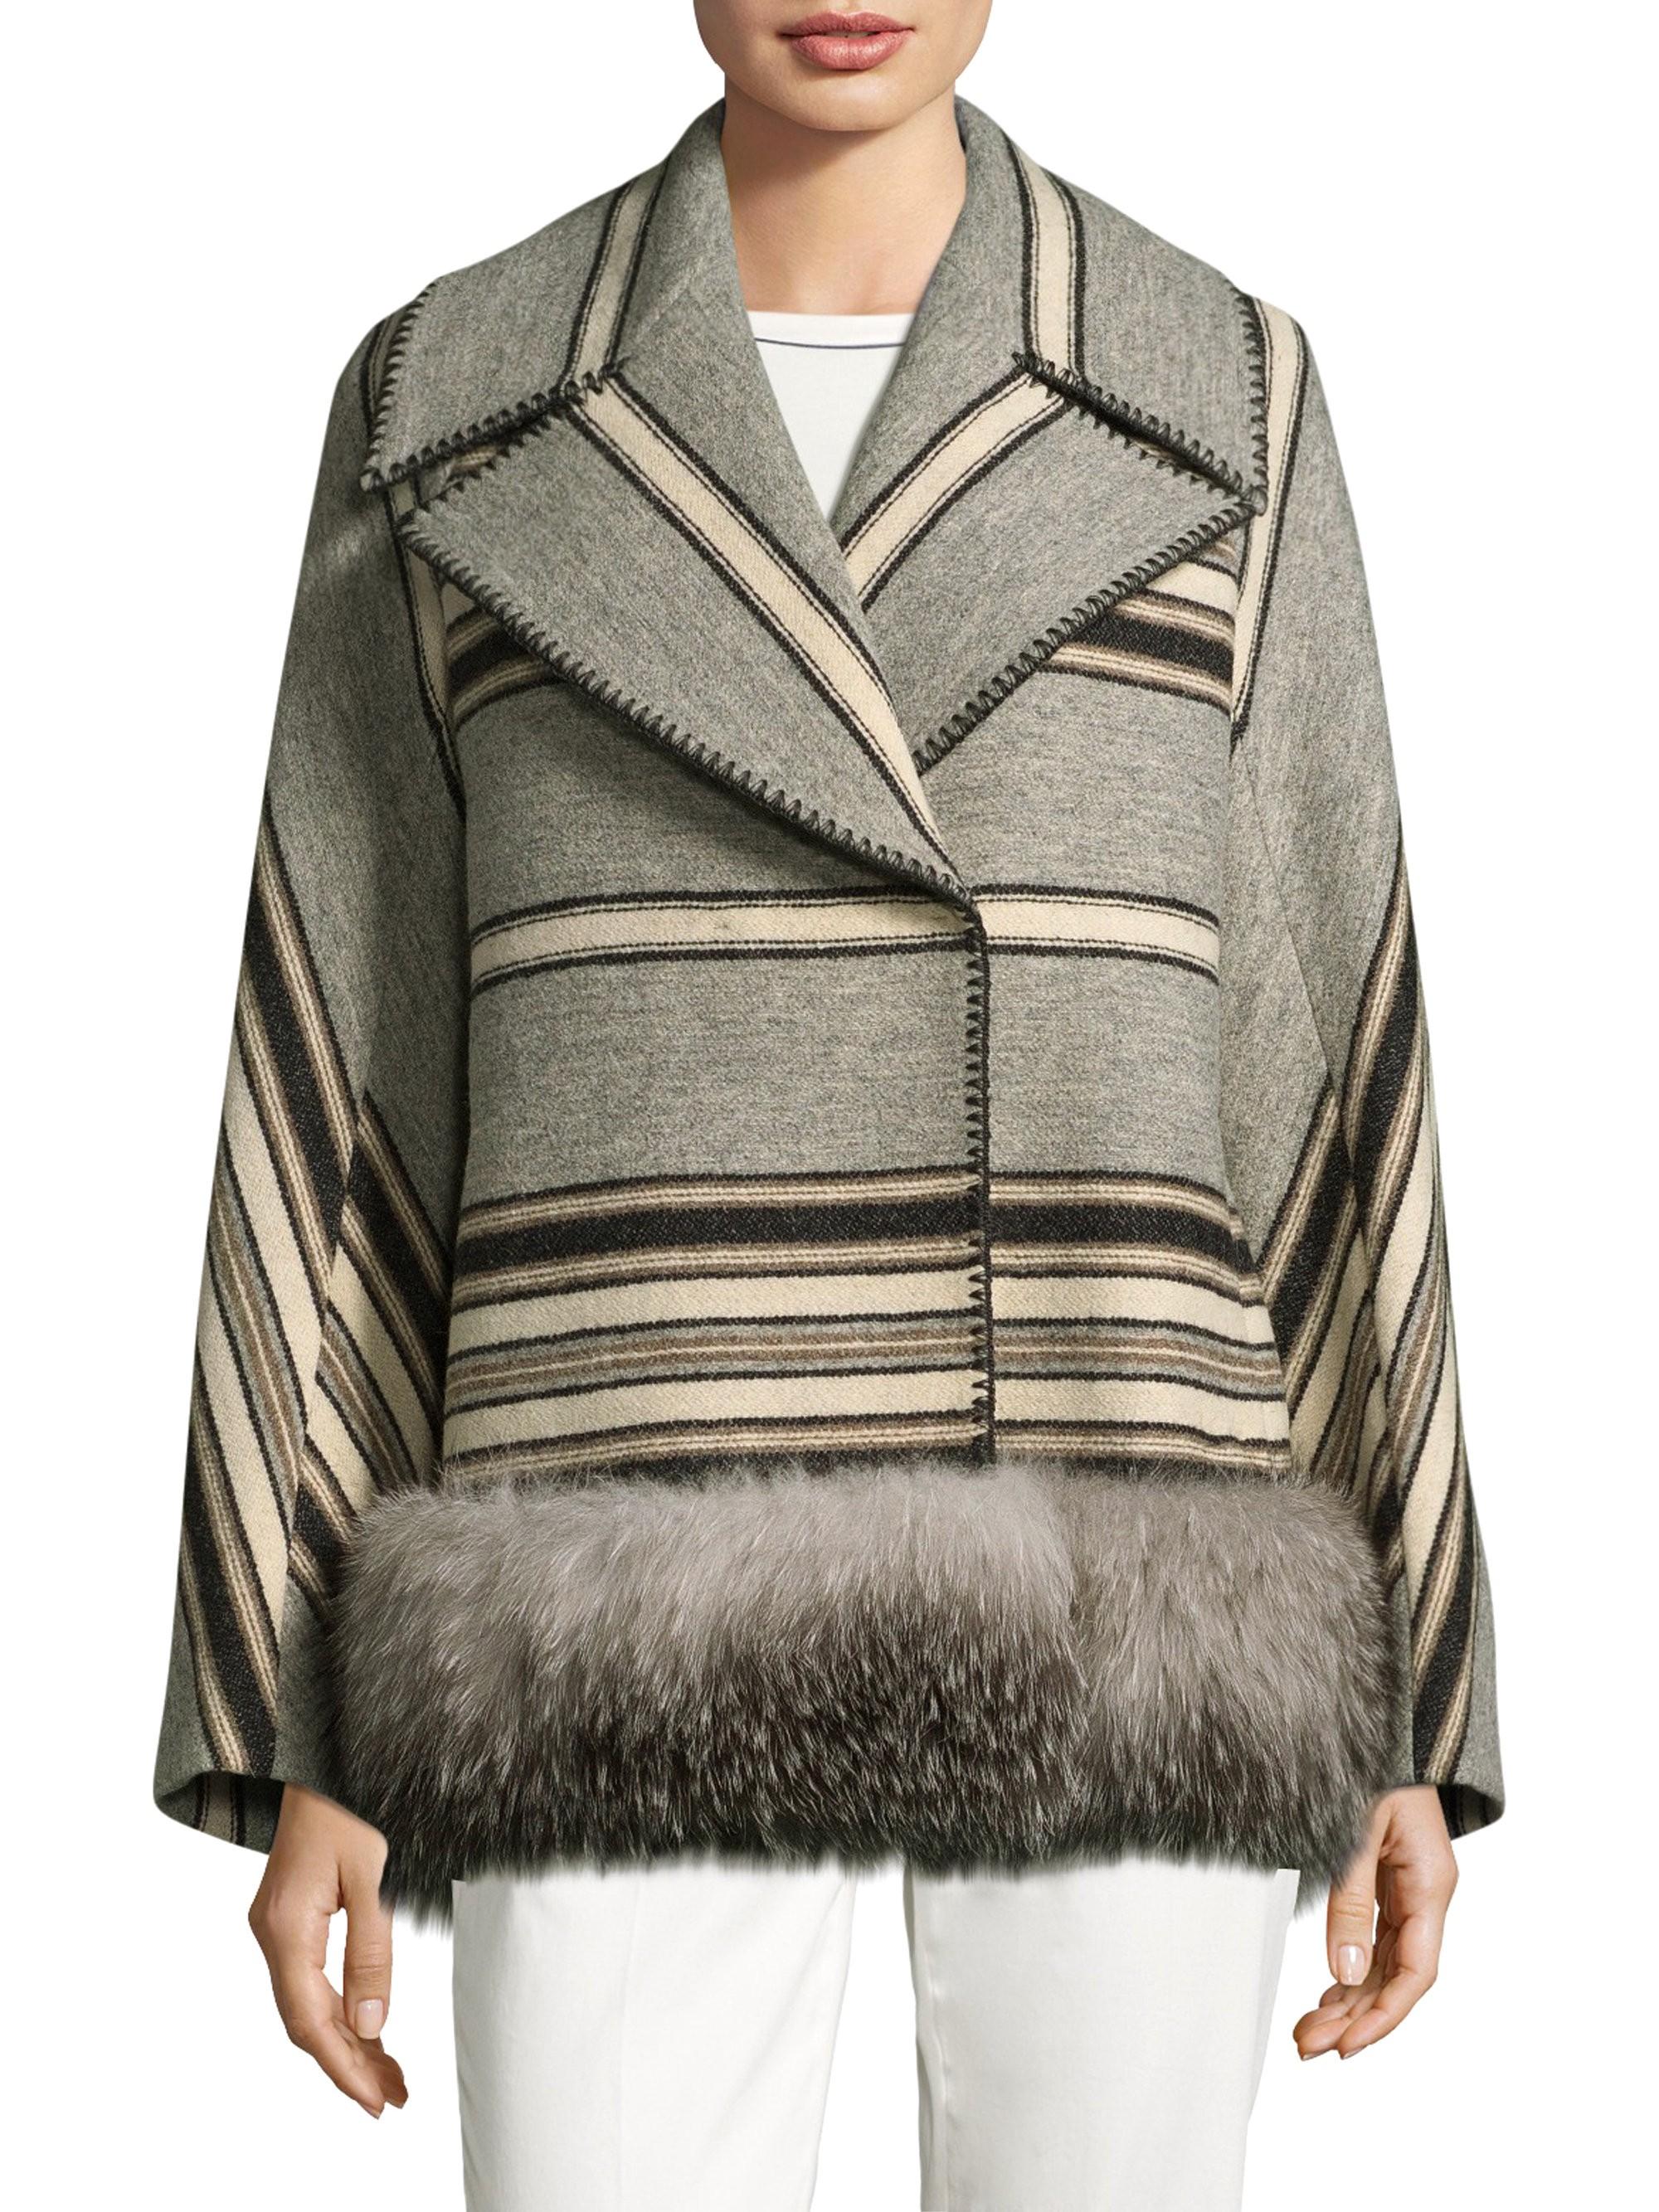 Weekend Max Mara Striped Fox Fur Trim Coat - Light Grey 12 ba4b282a1b4